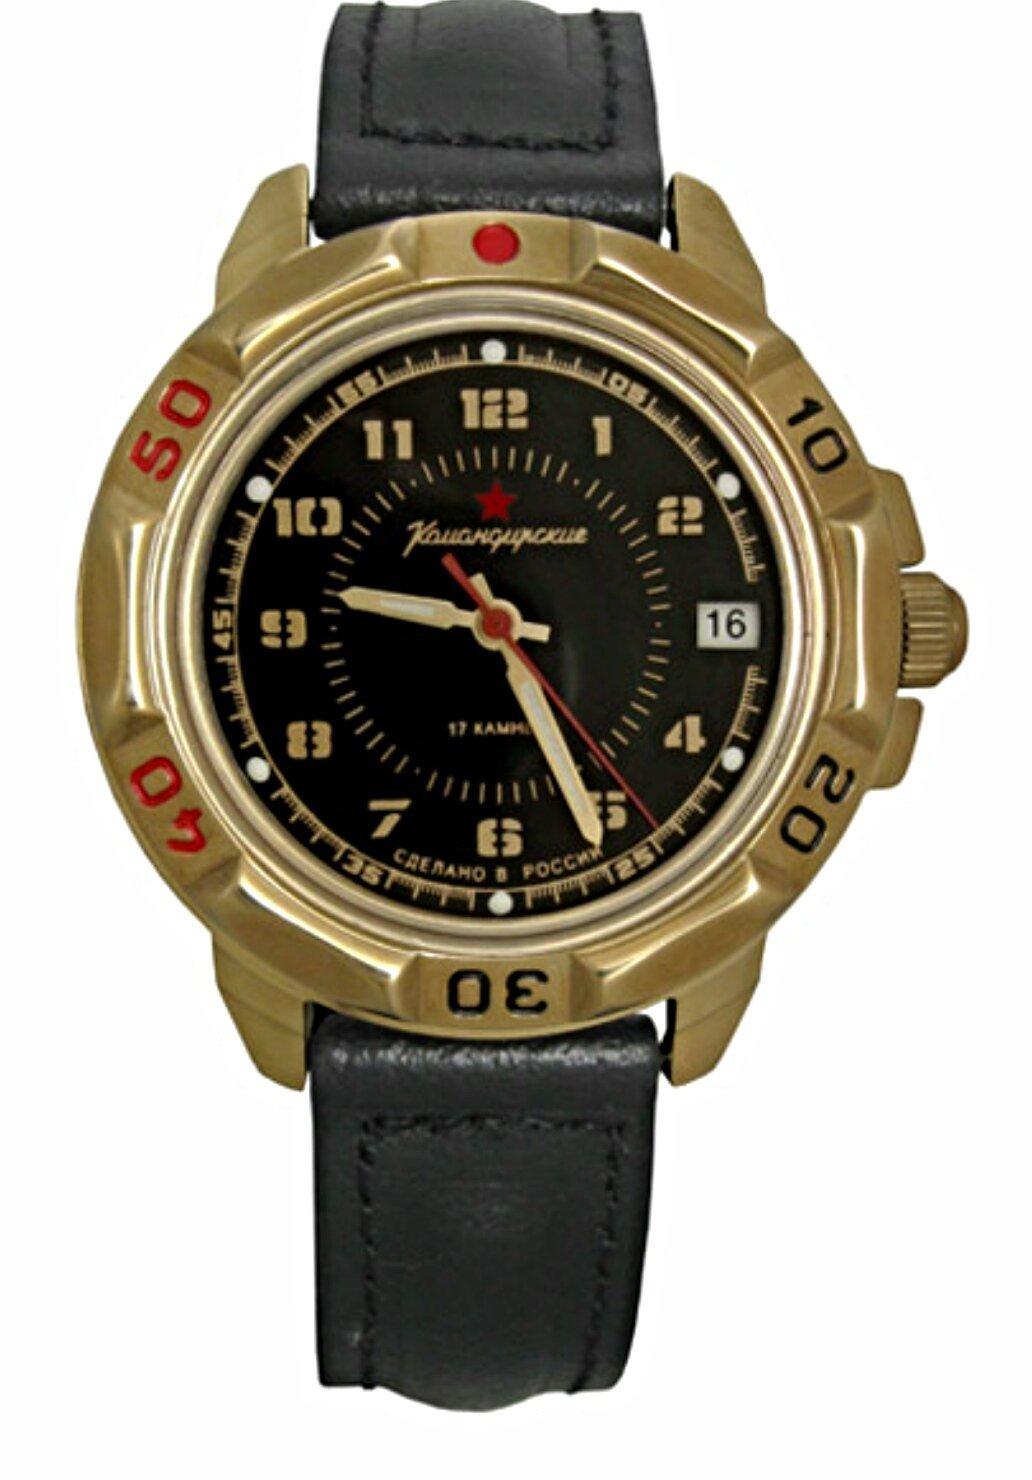 Vostok Komandirskie 439123 / 2414A Military Military Komandirskie Commander W... - $45.11